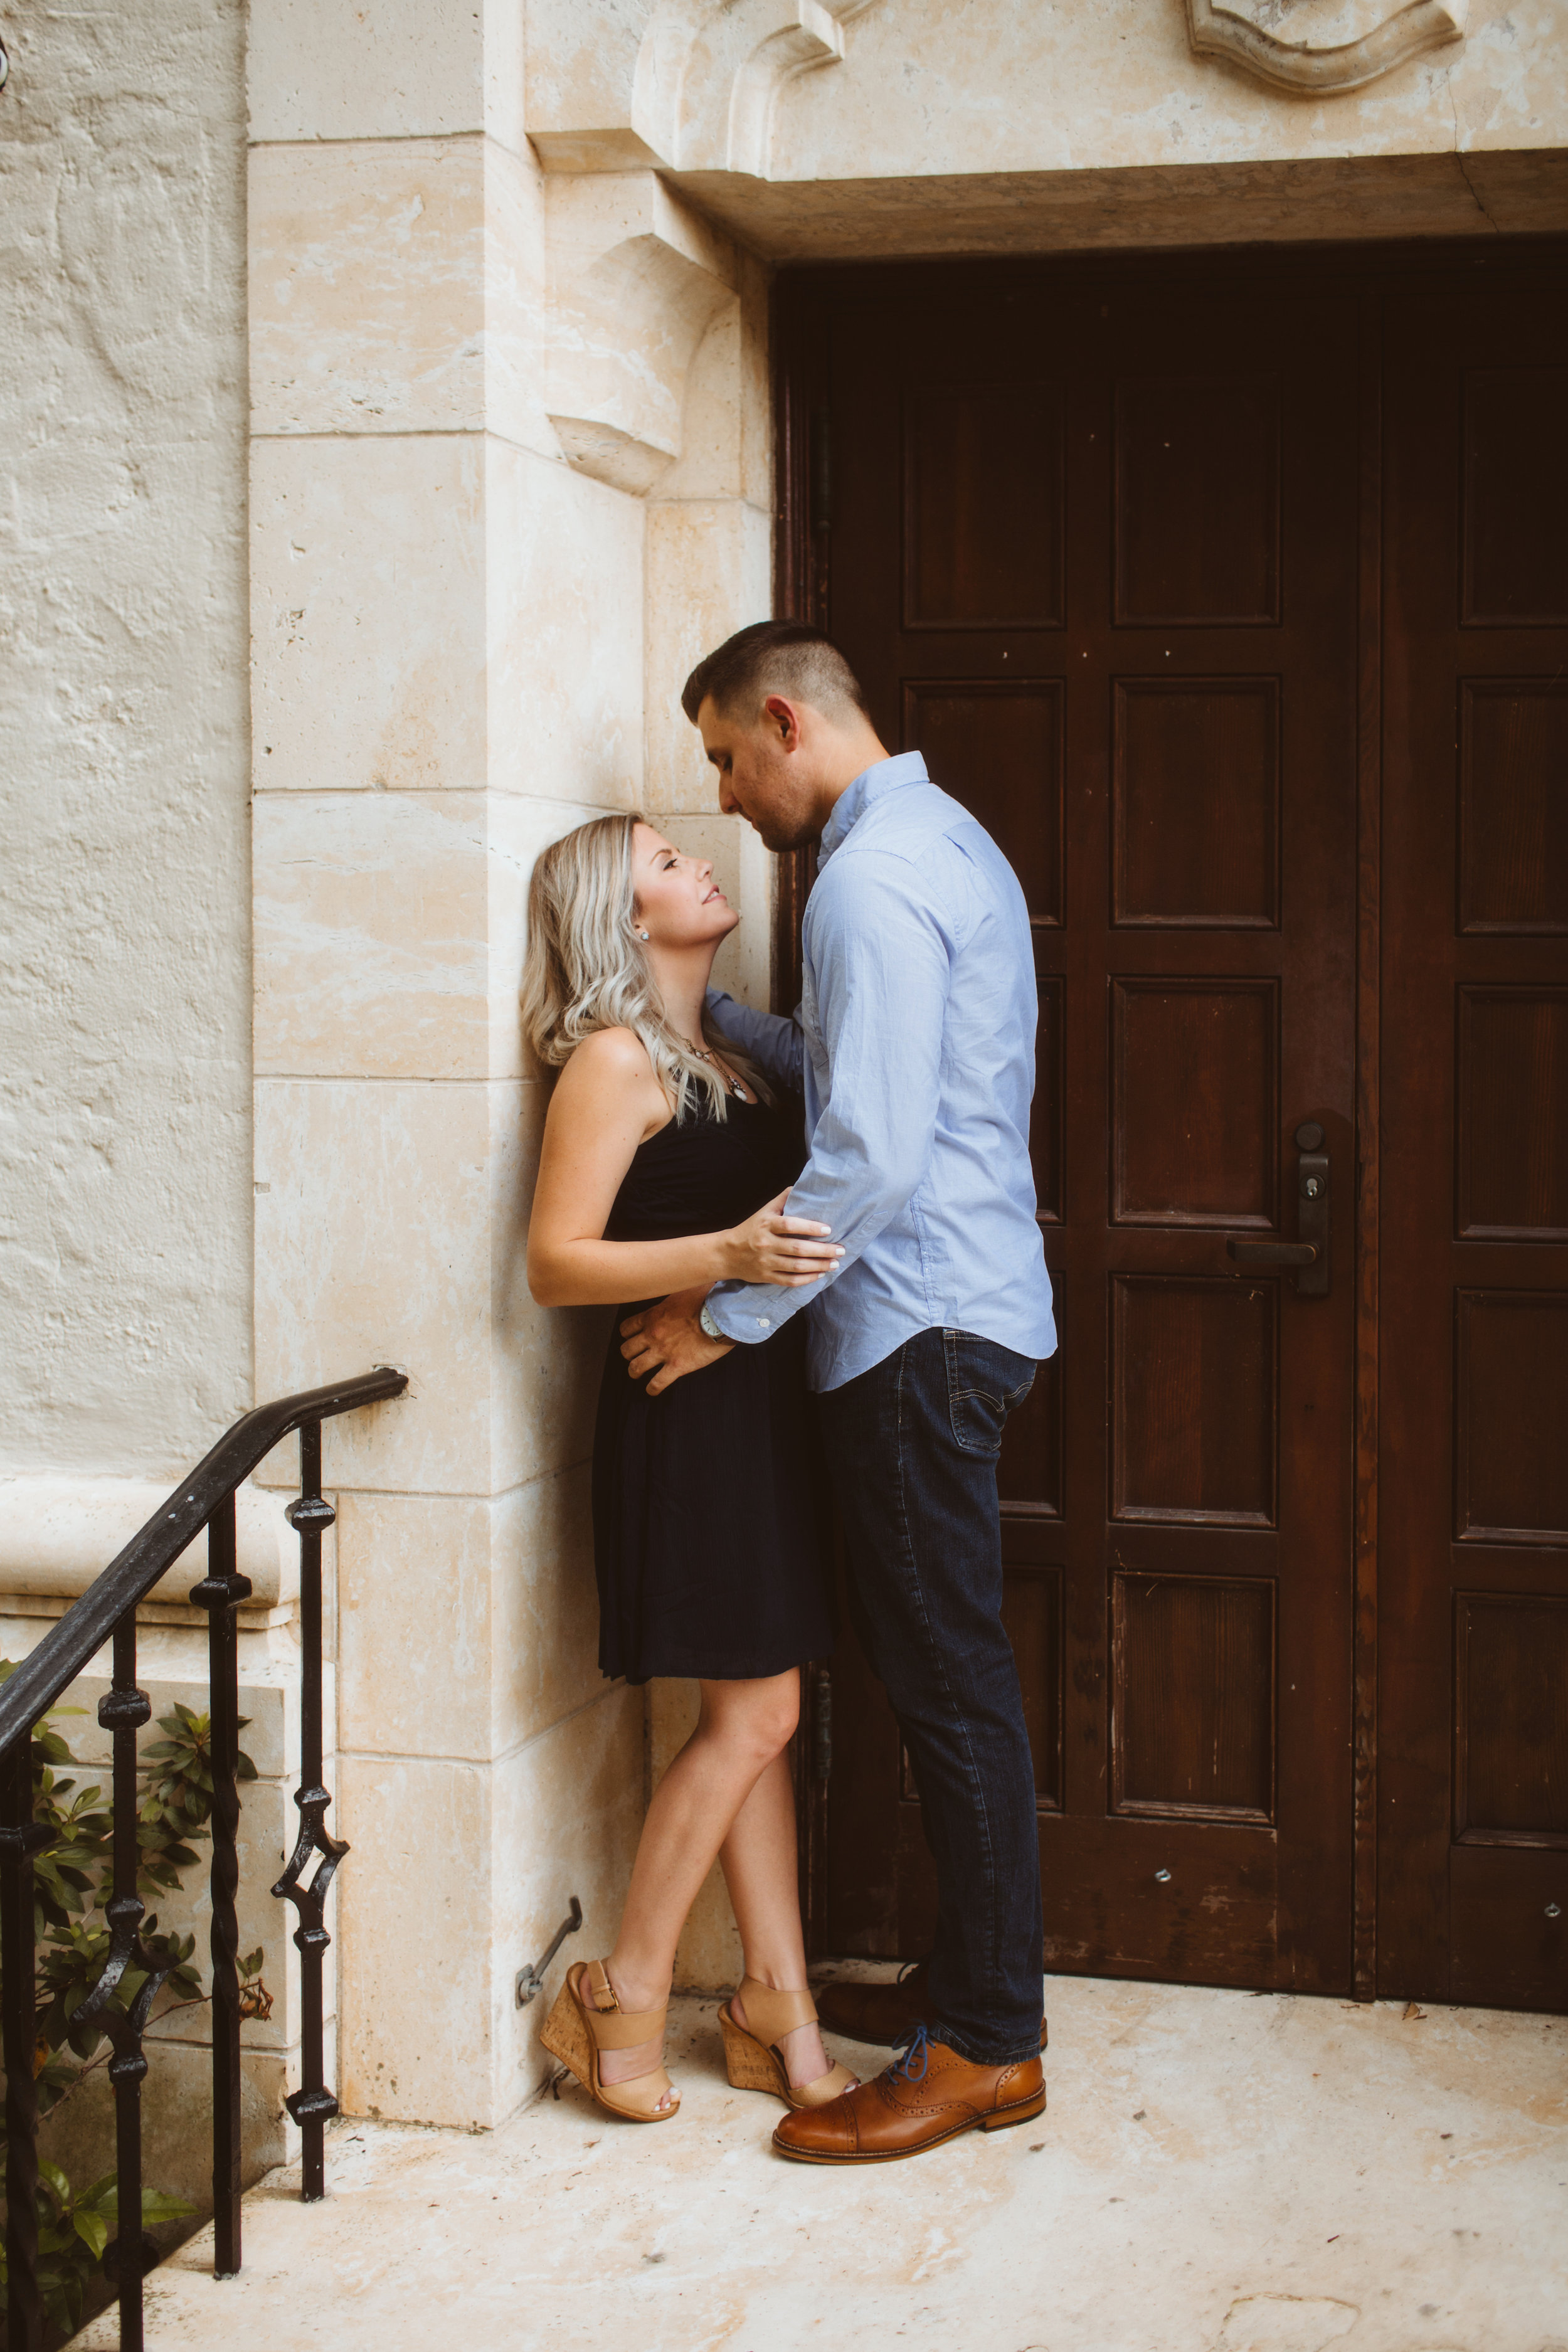 Engagement | Vanessa Boy Photography | vanessaboy.com |-16-2.com |final .jpg